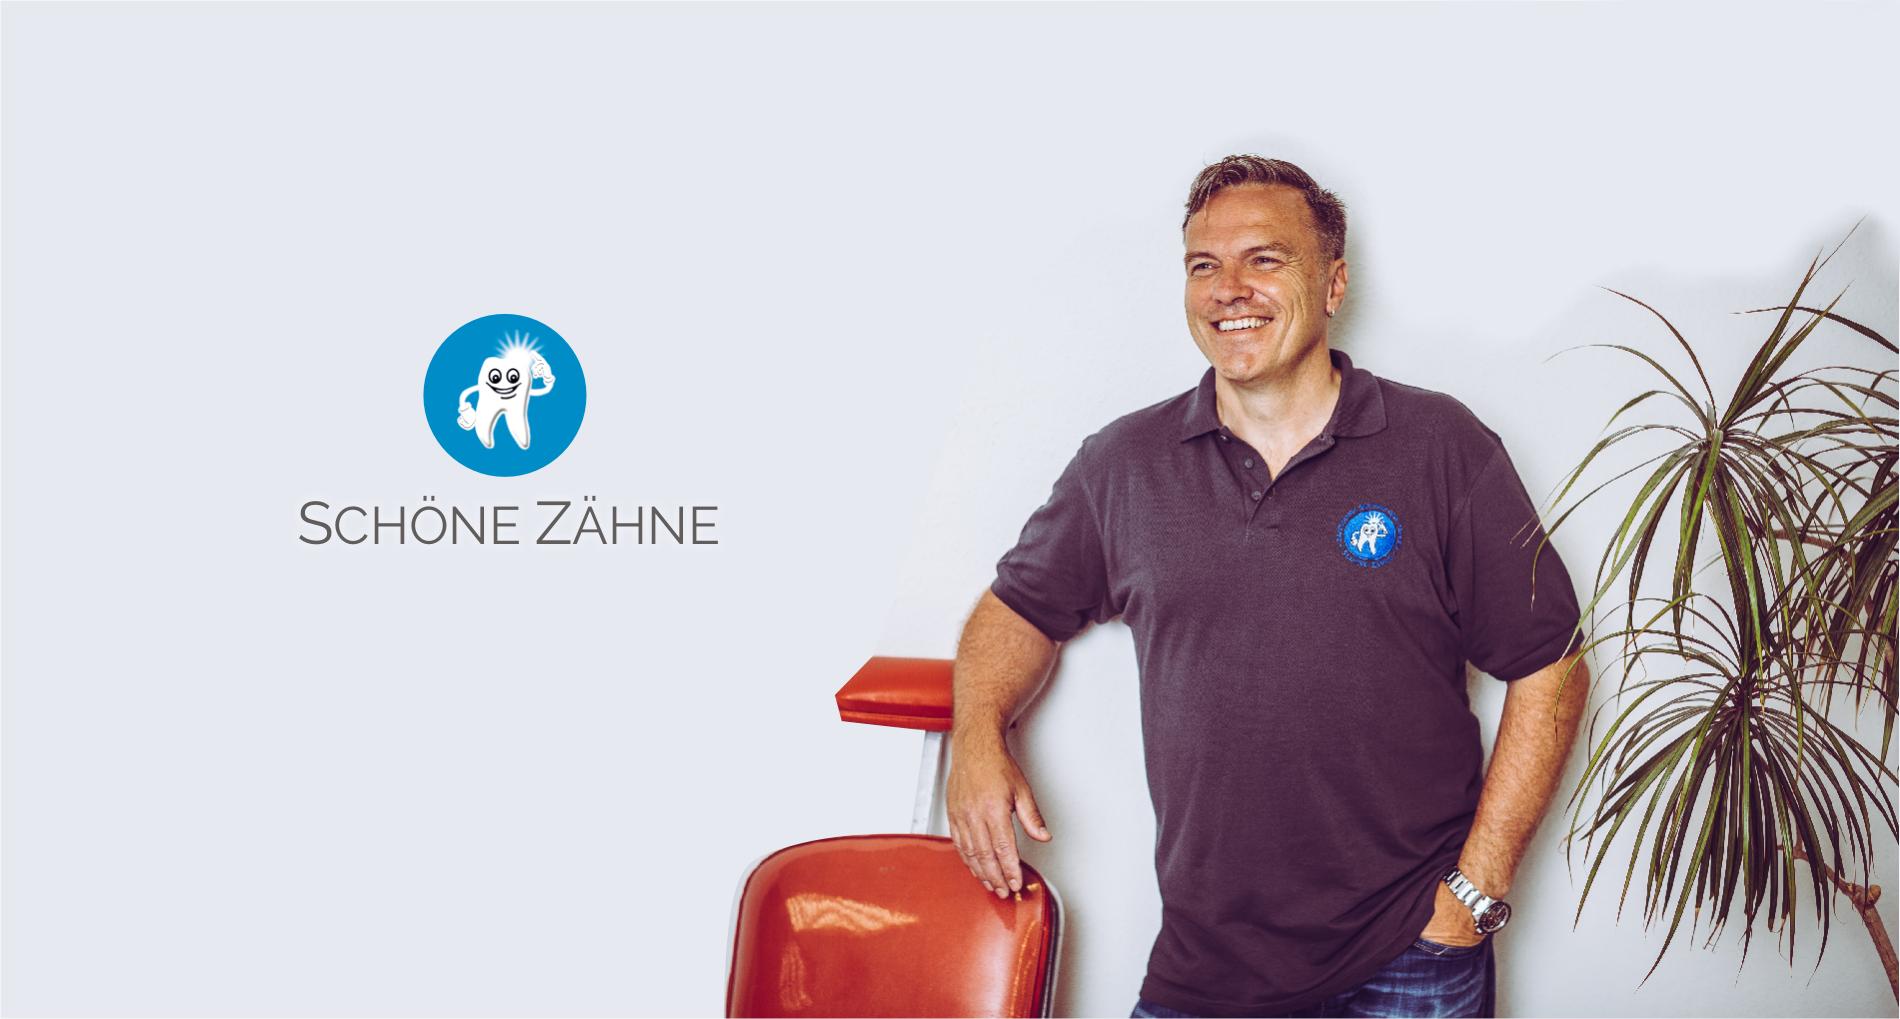 Zahntechnik Zahnlabor Rainer Böttger Waghäusel Wiesental Mannheim Heidelberg